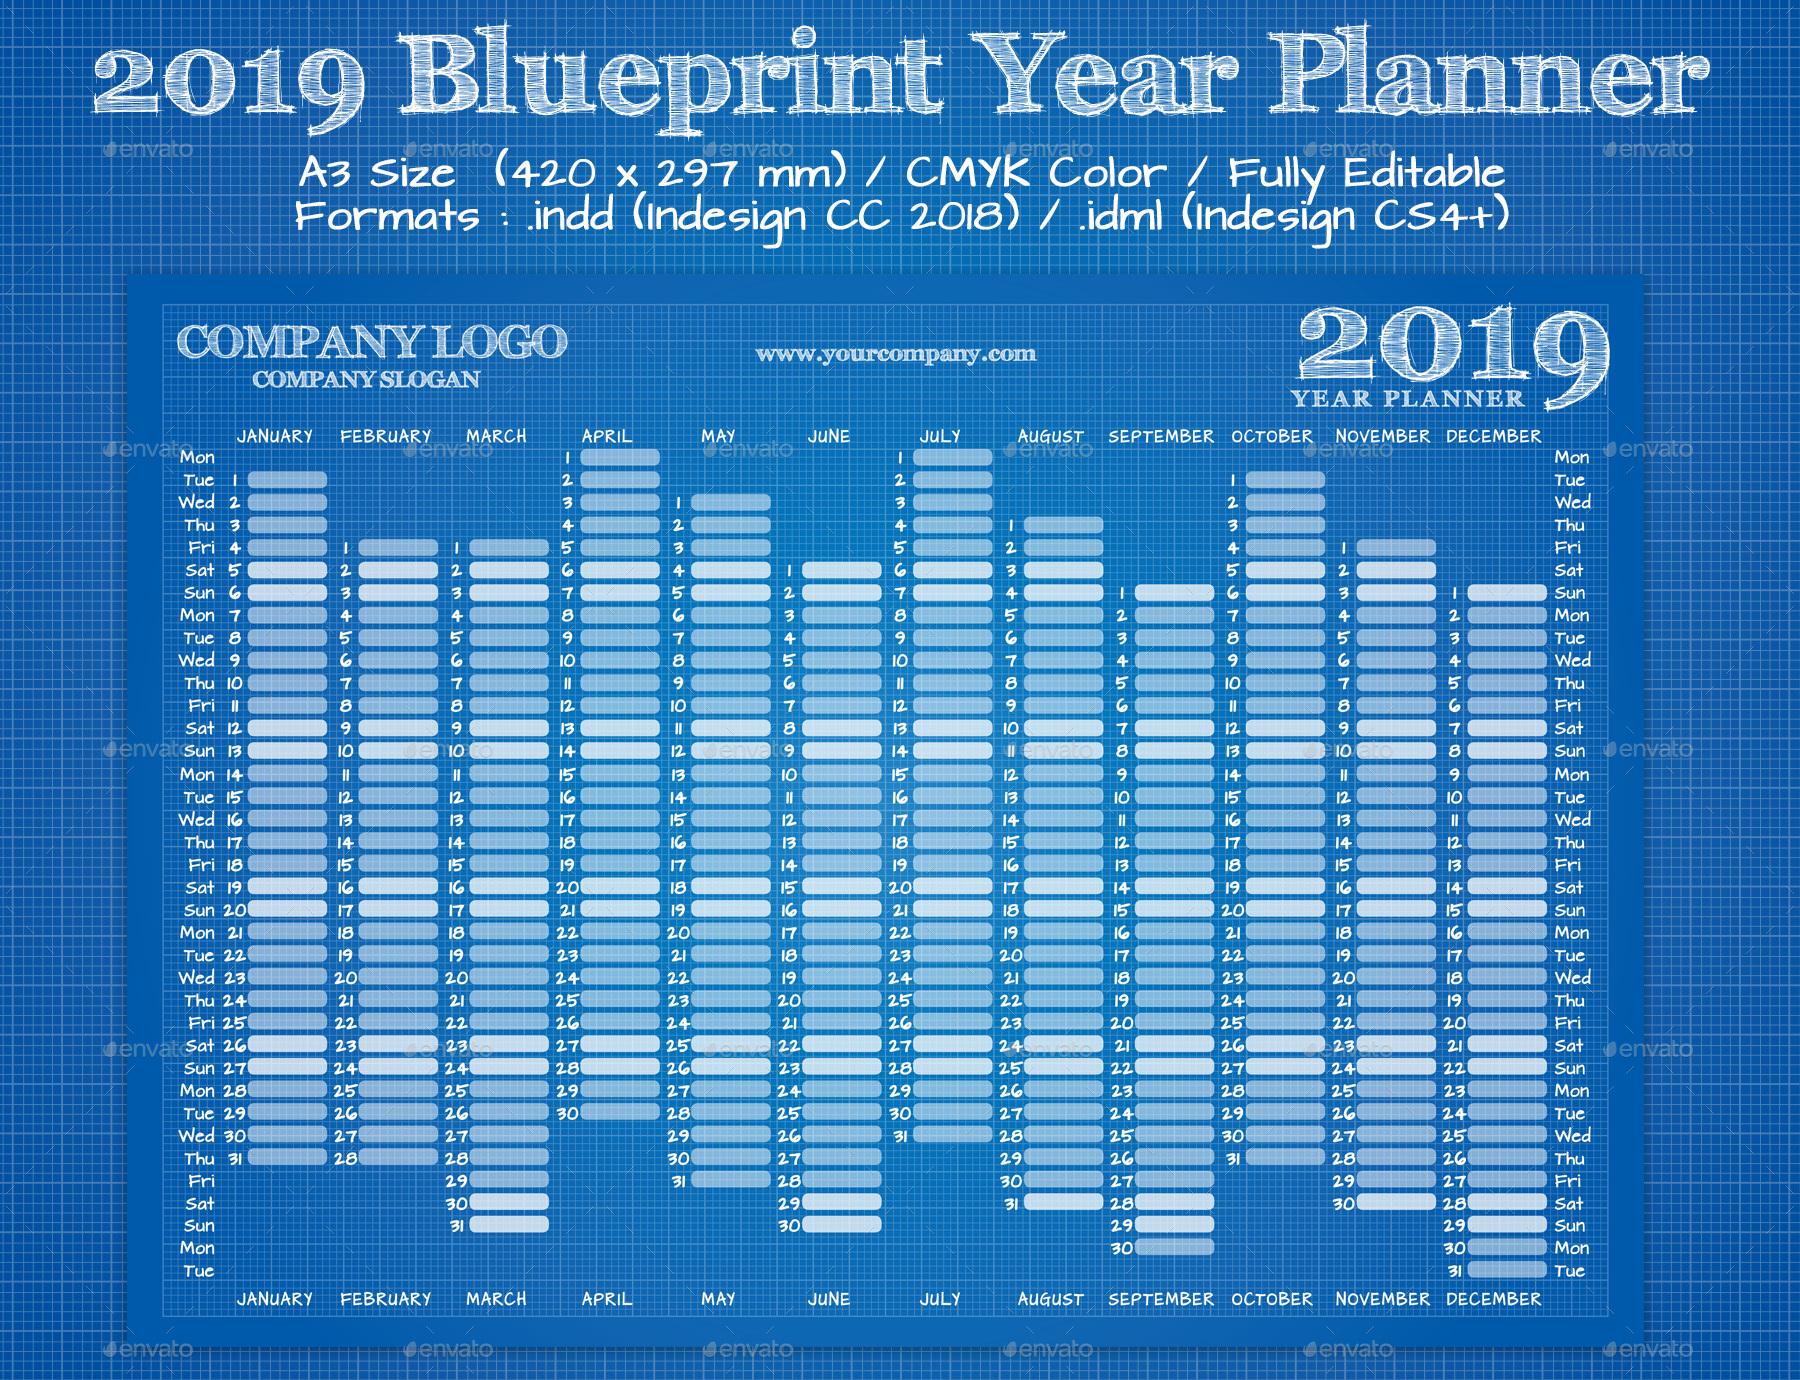 2019 blue print year wall calendar 1jpg 2019 blue print year wall calendar 2jpg